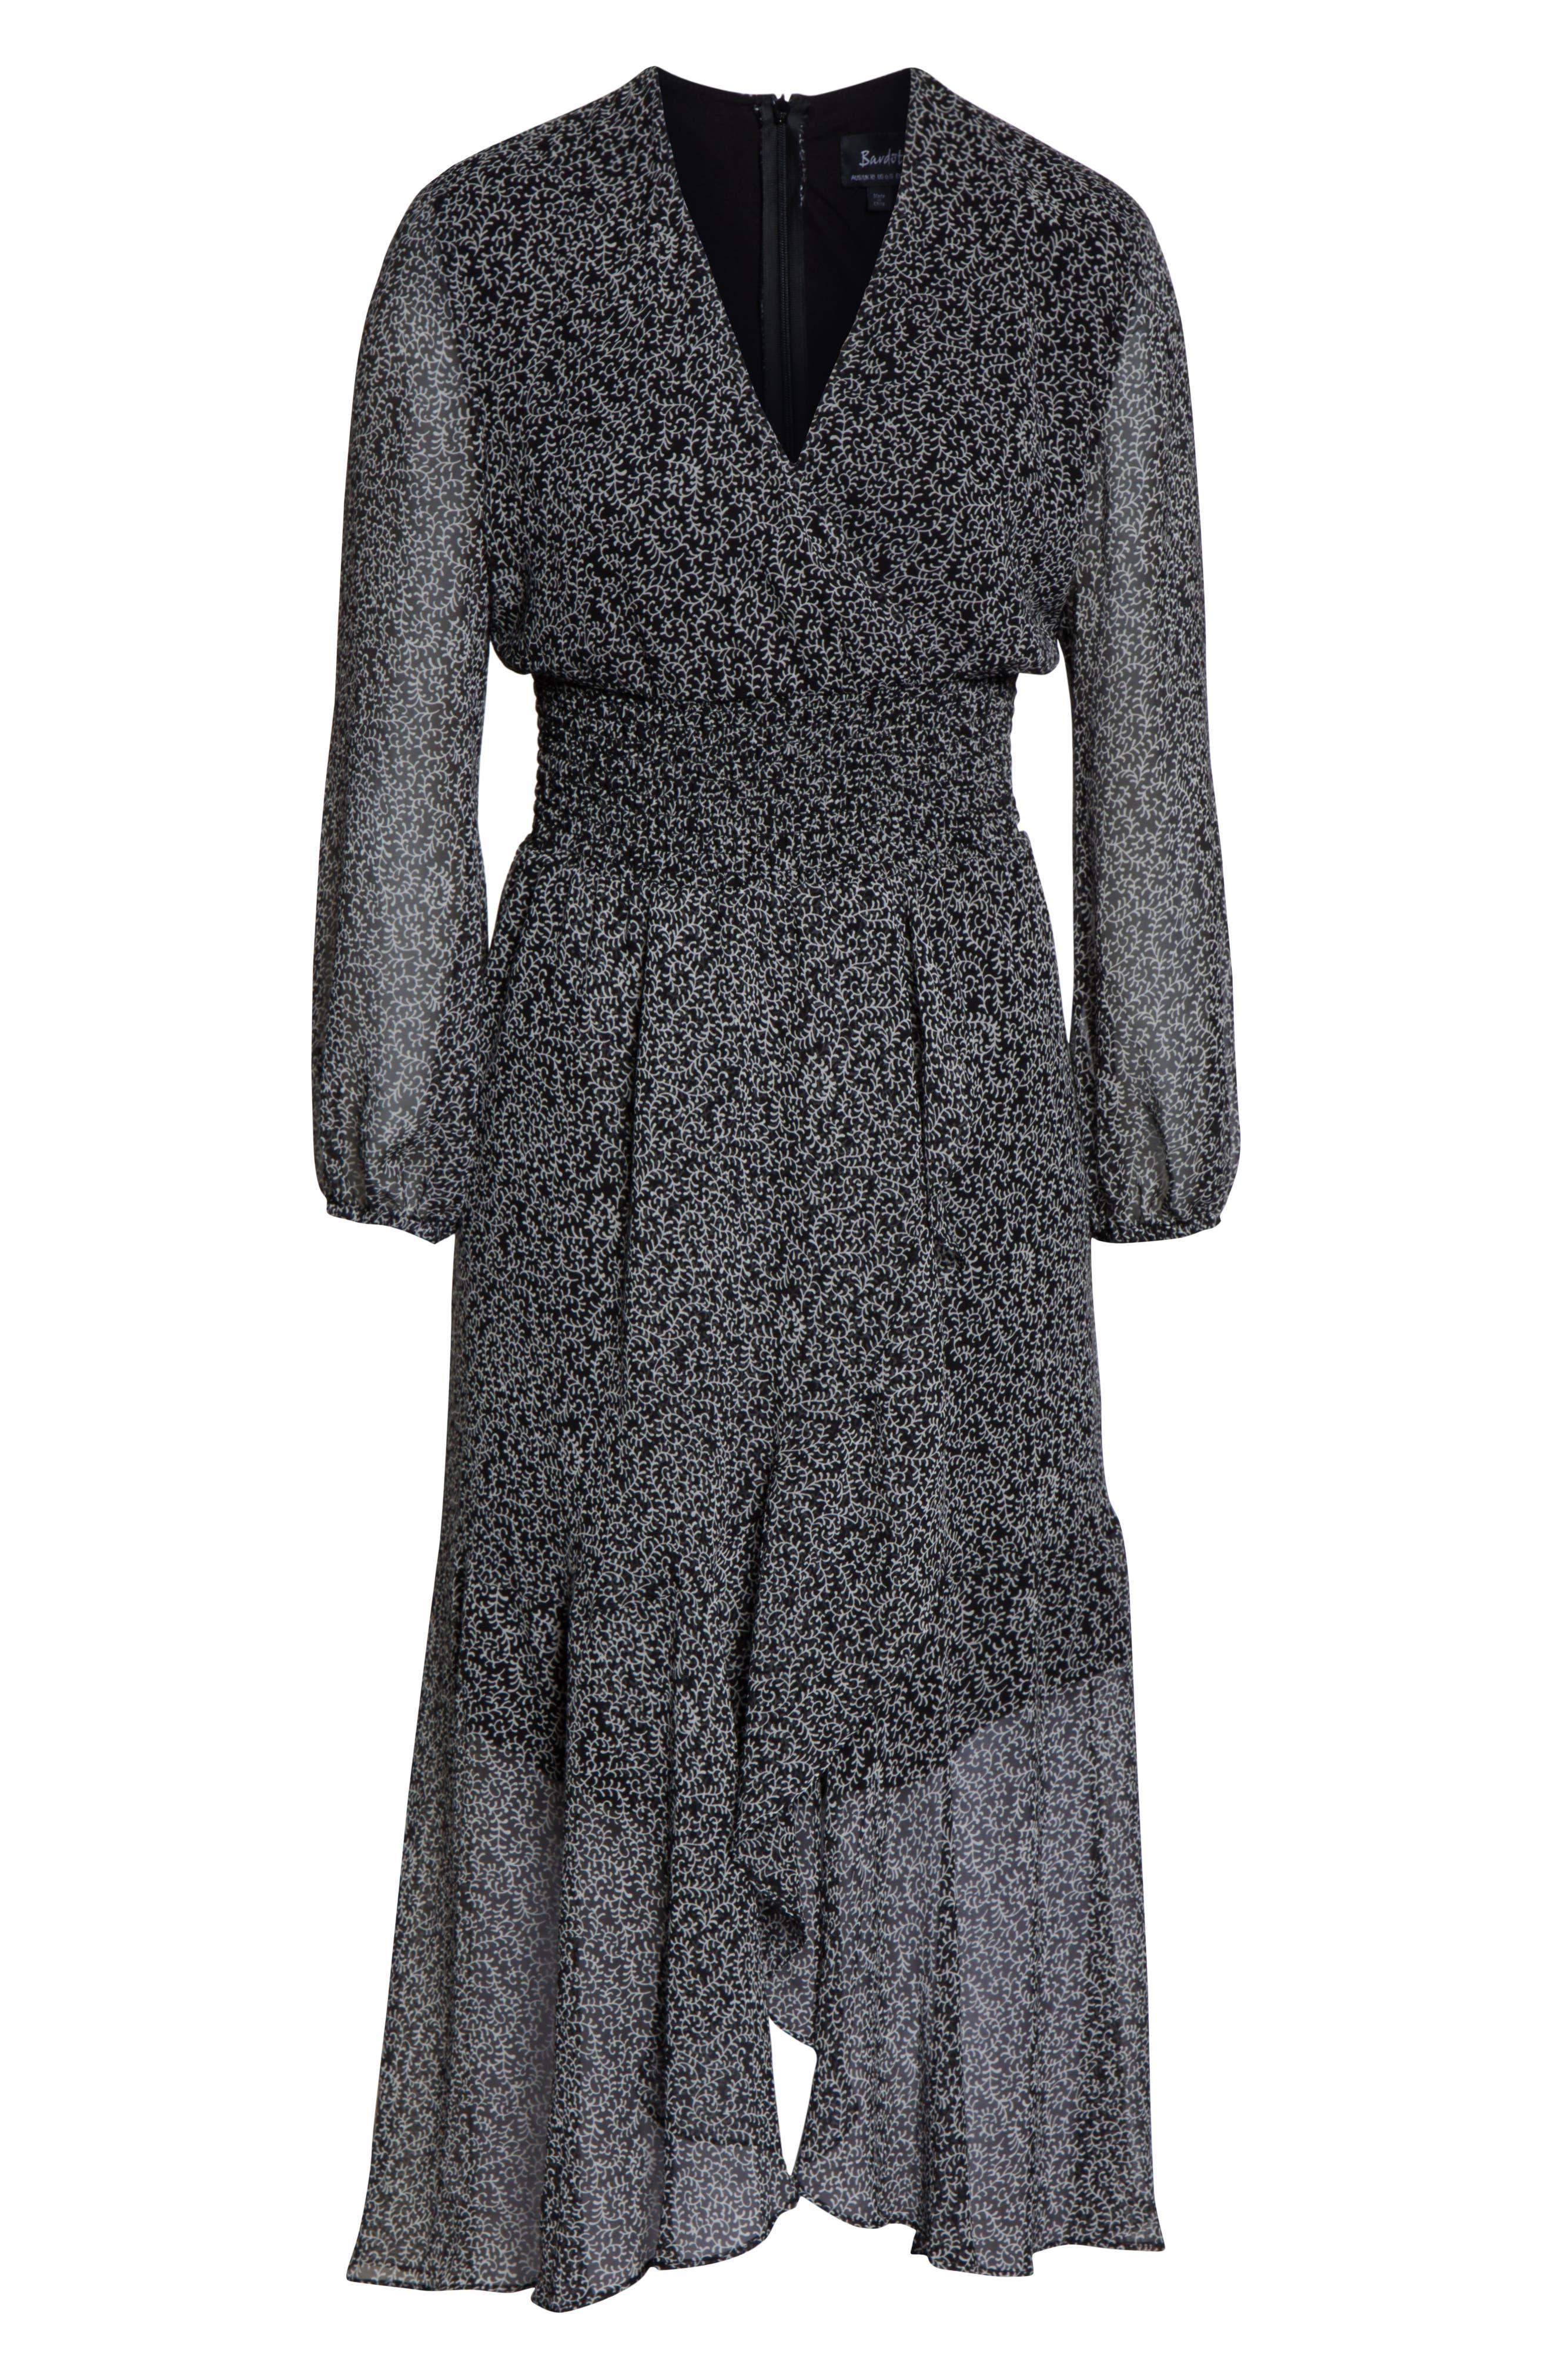 BARDOT,                             Sally Faux Chiffon Wrap Dress,                             Alternate thumbnail 4, color,                             ABSTRACT PAISLEY